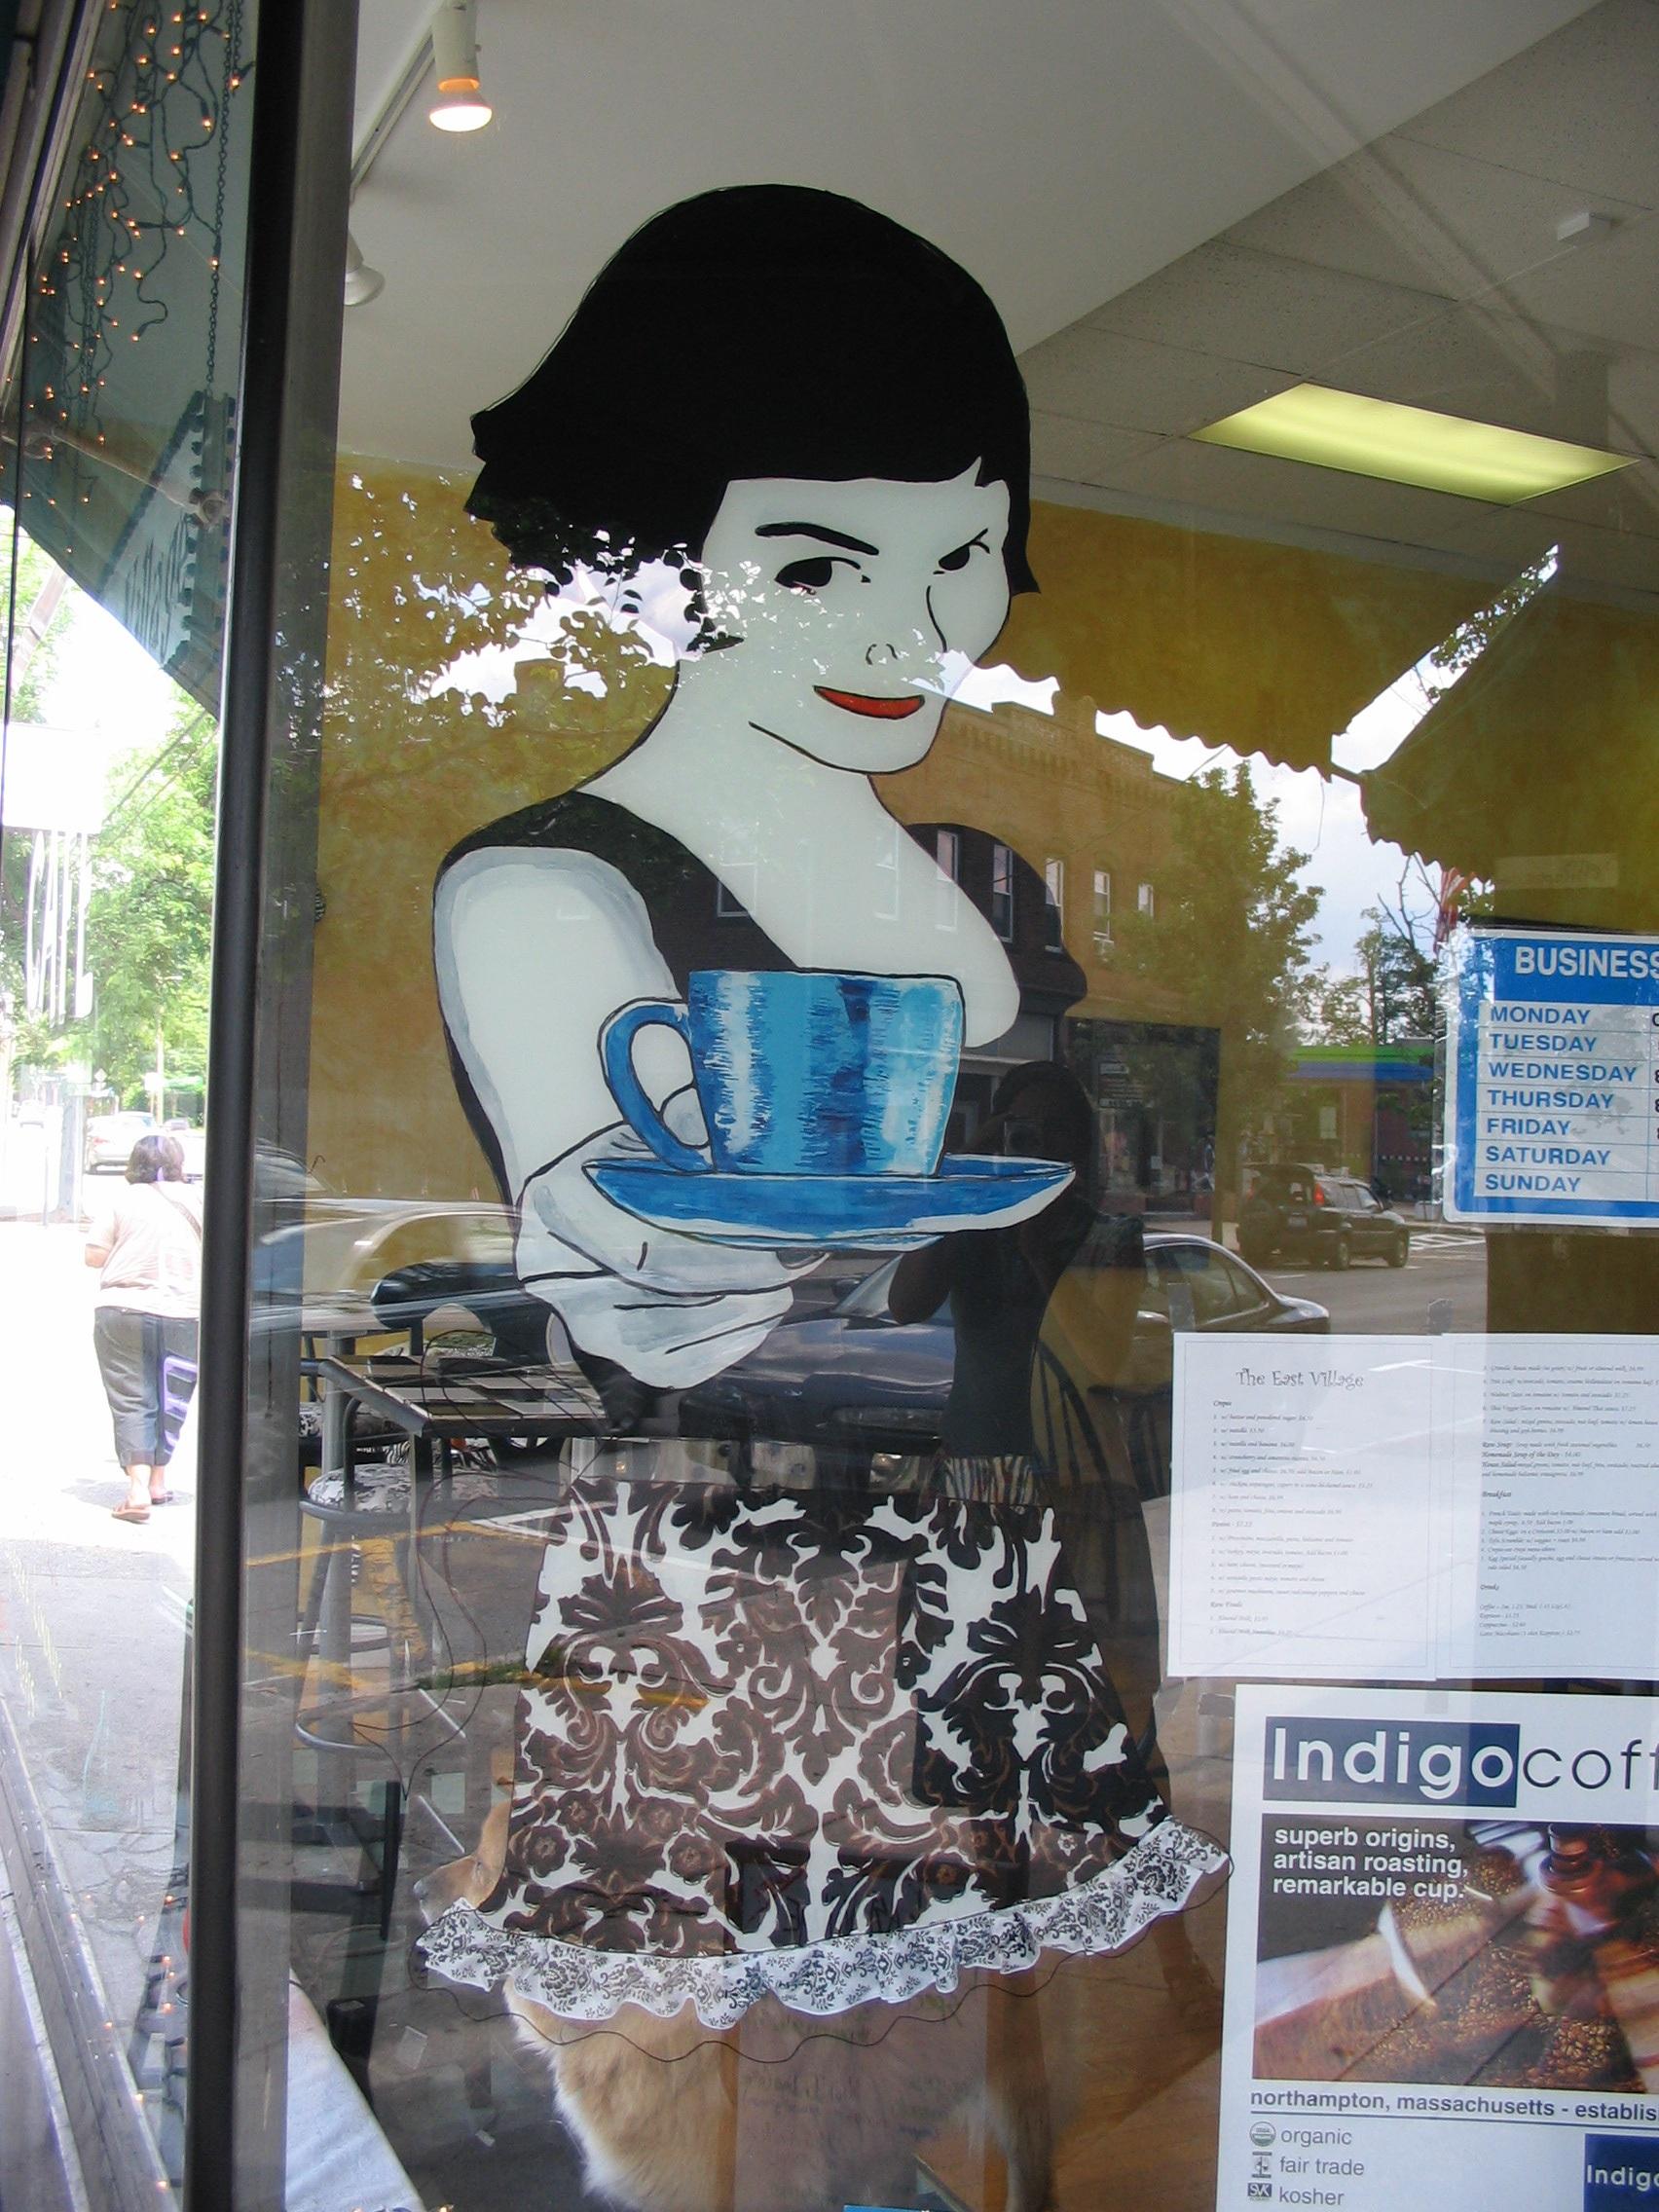 East Village Art Gallery & Cafe